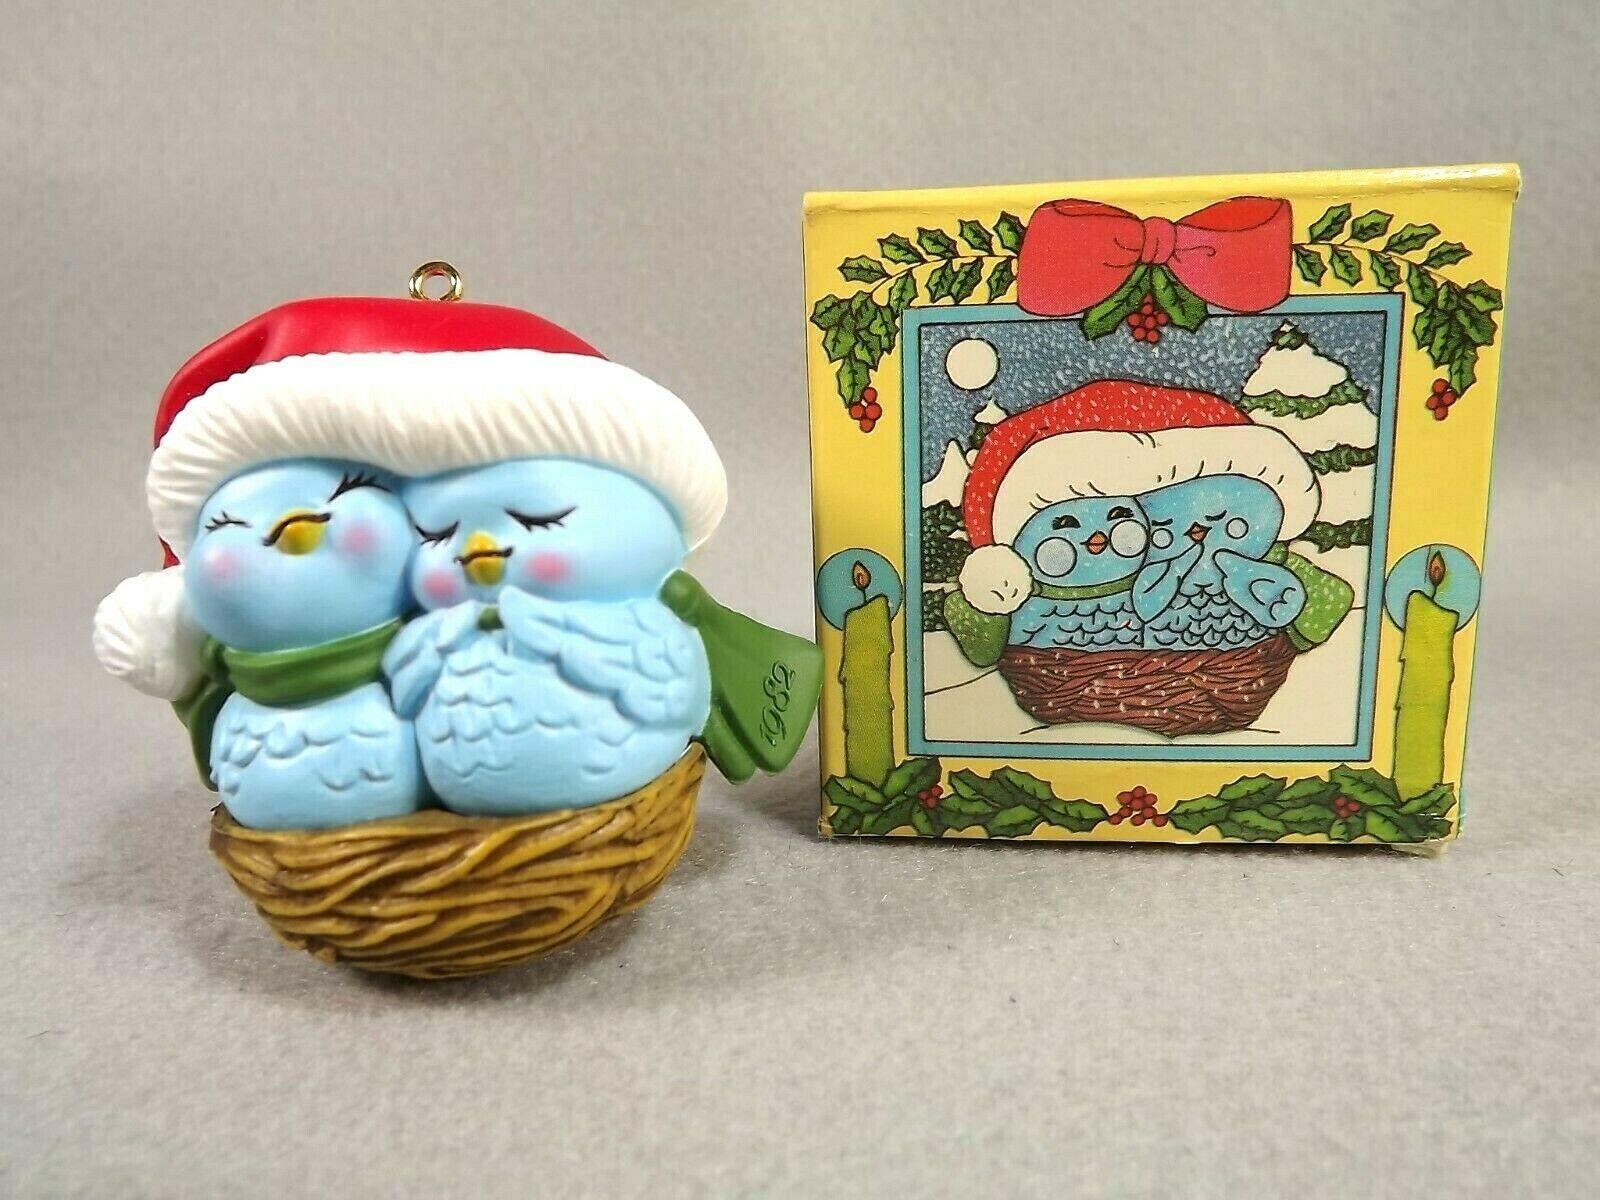 Avon Christmas Ornaments Nestled Together Hoppy Holidays Winter Pals 1982-84